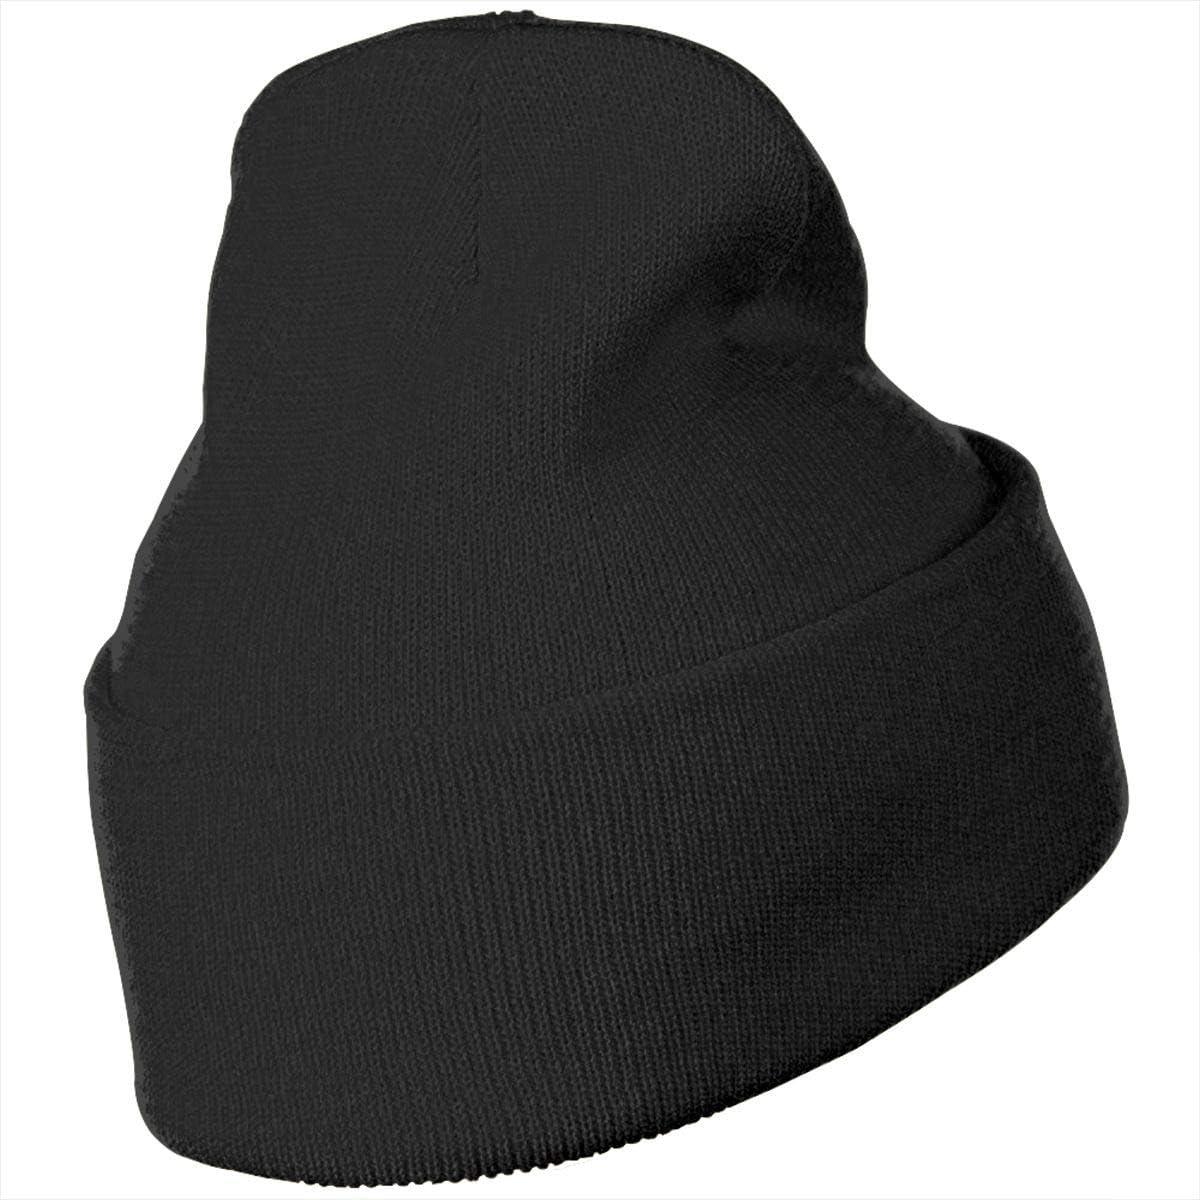 Labor Day American Flag Beanie Cap Hat Men /& Women Knitting Hats Stretchy /& Soft Beanie